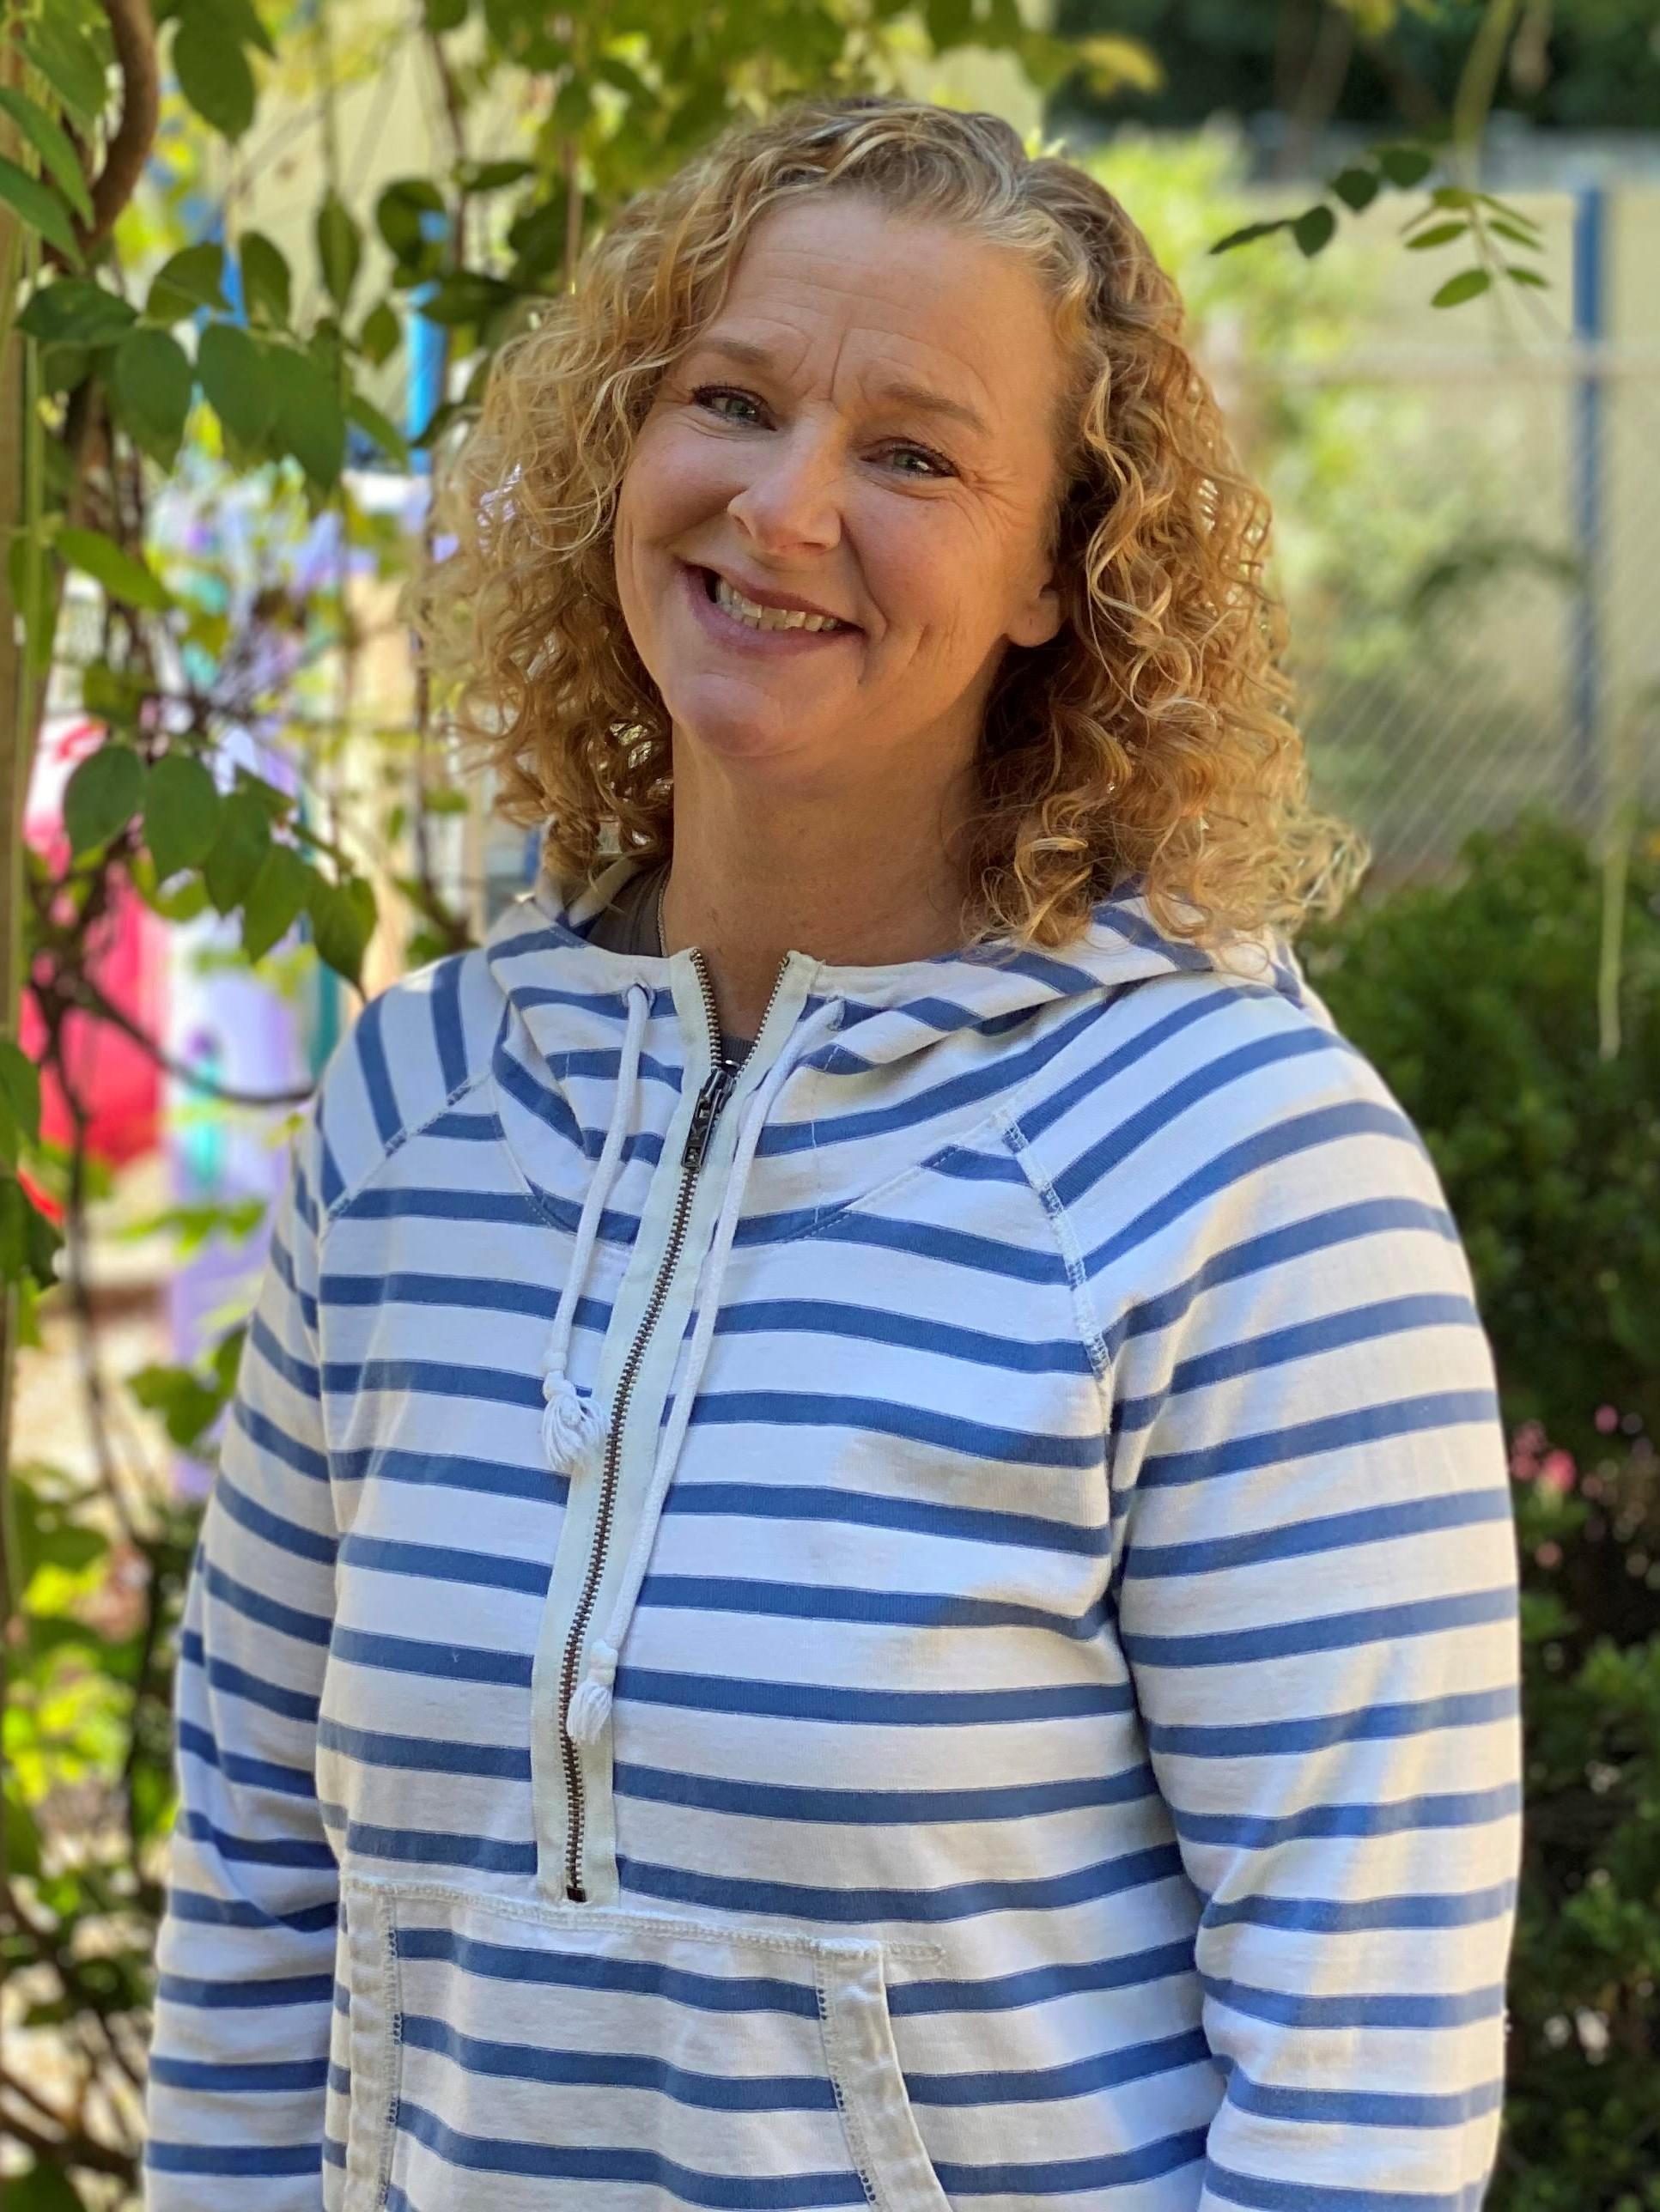 Kristen Greeley